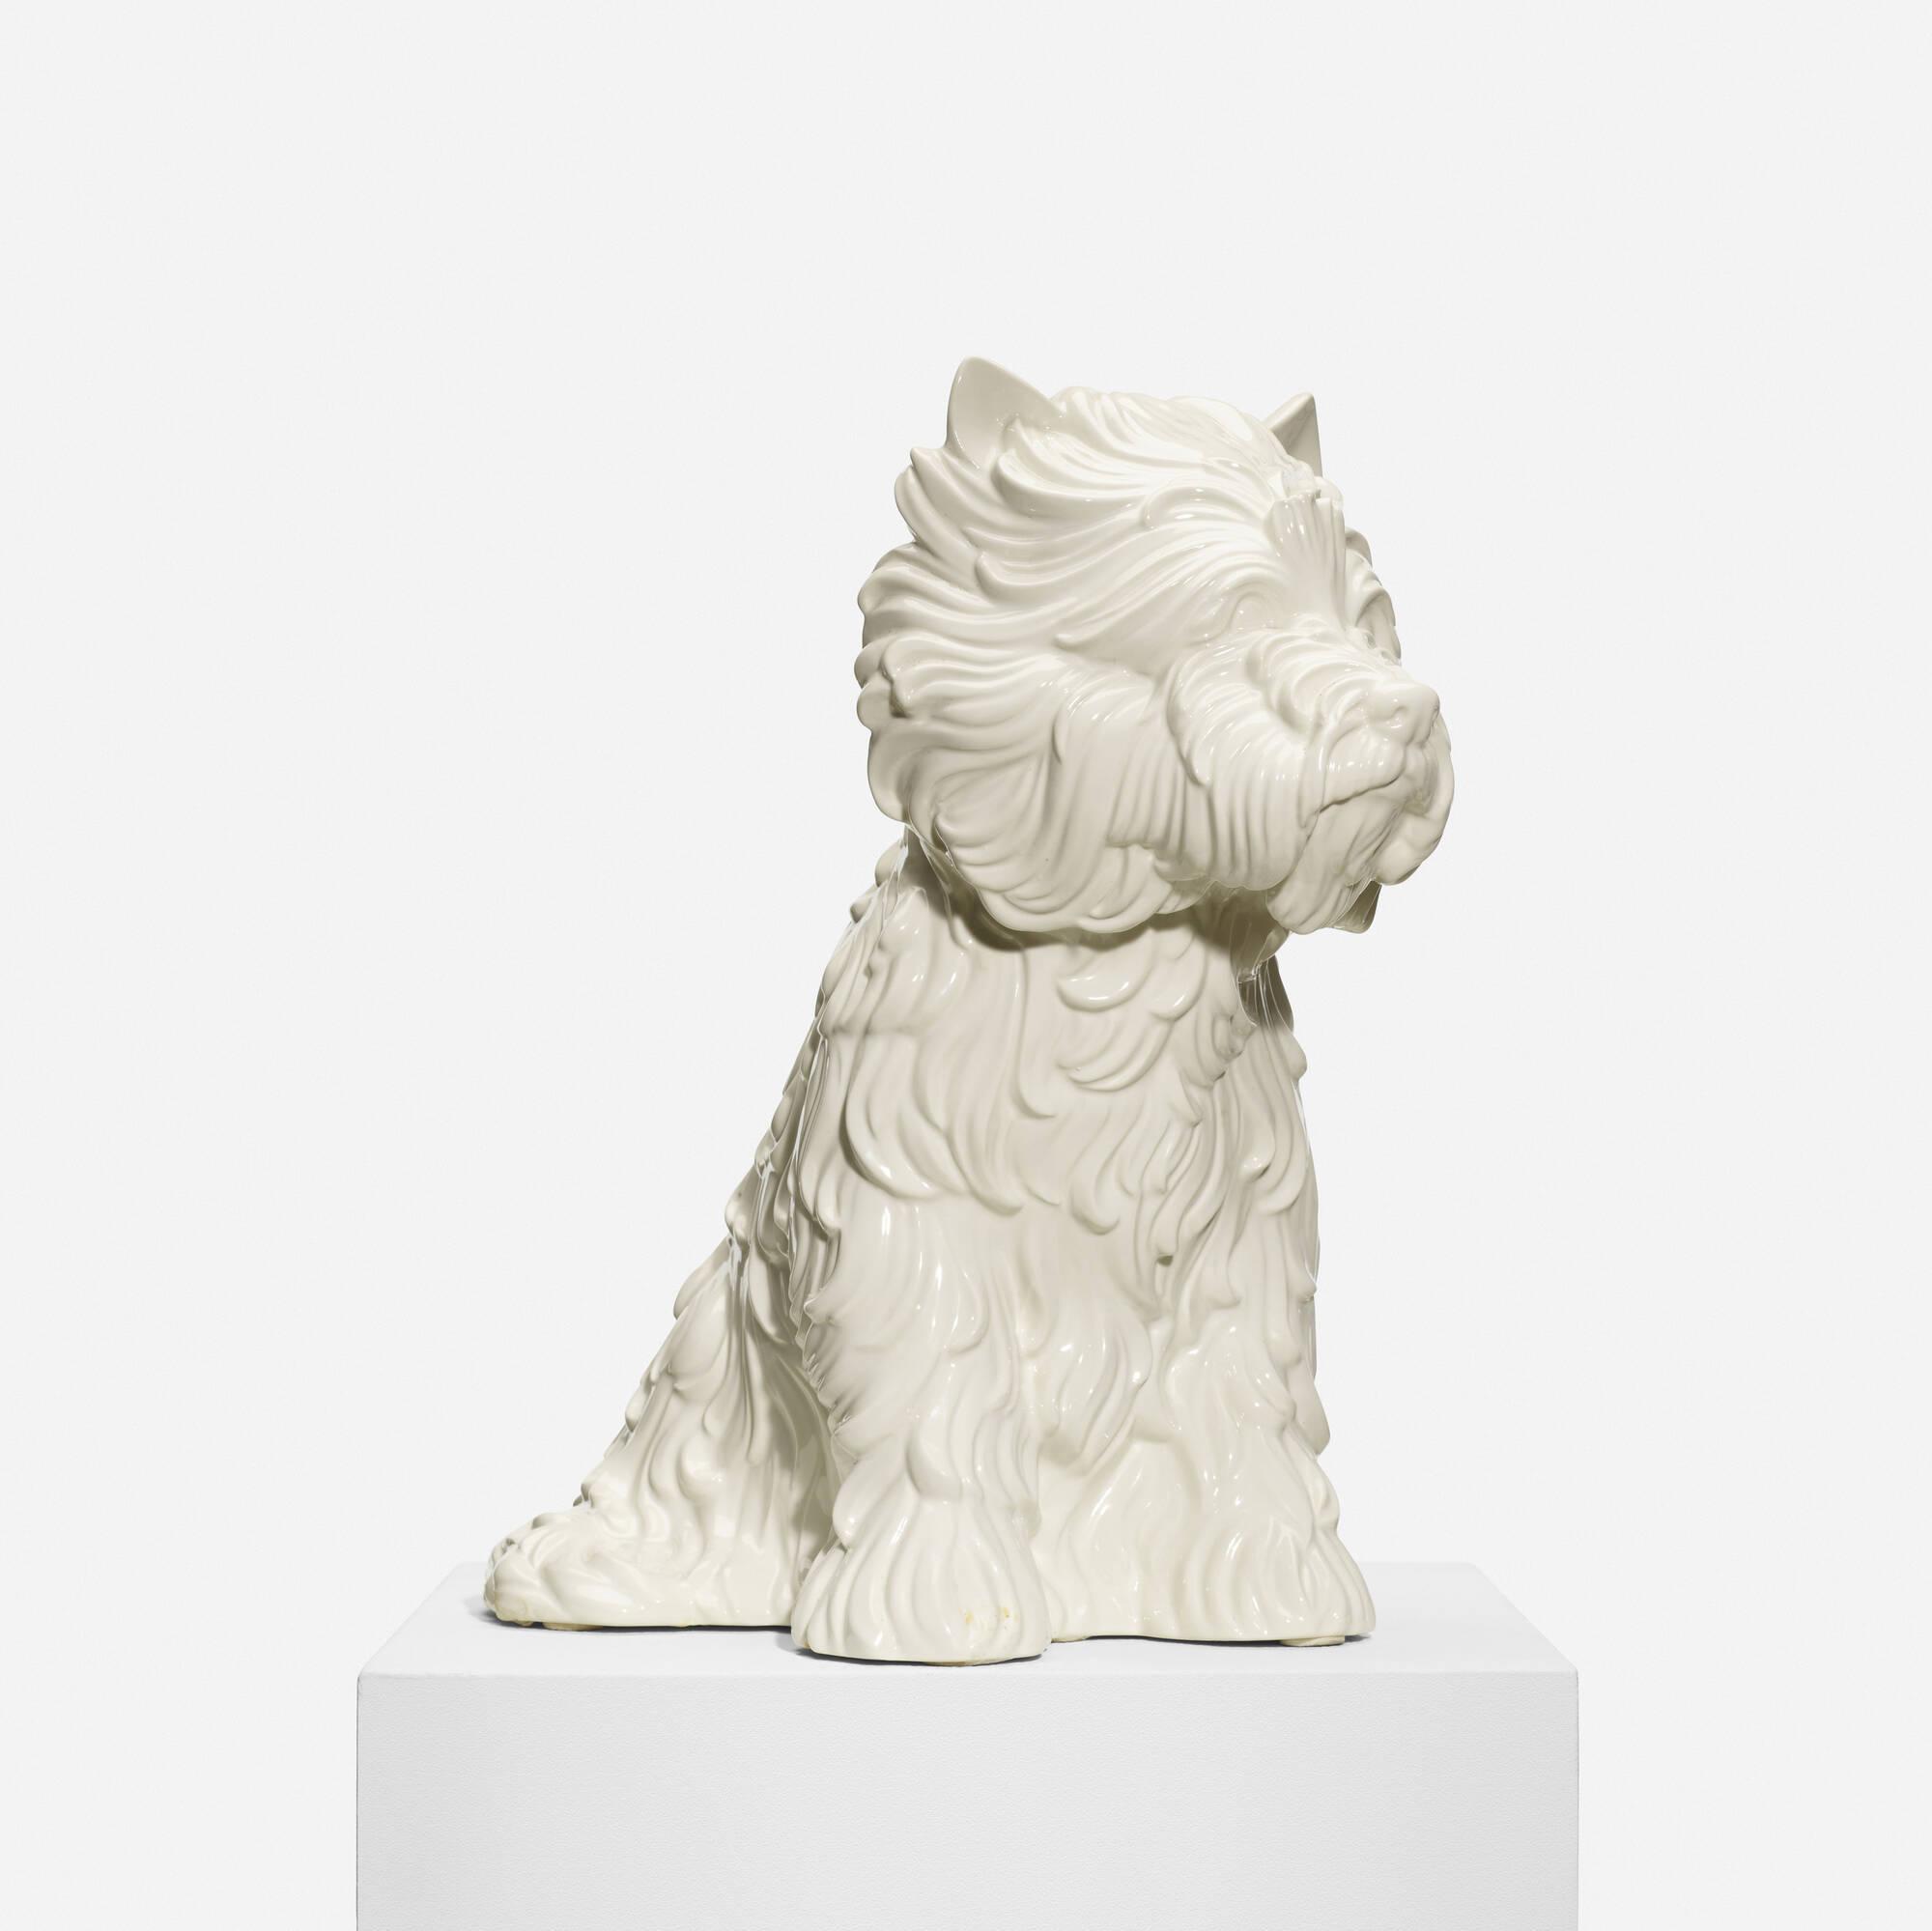 228: Jeff Koons / Puppy (vase) (2 of 3)